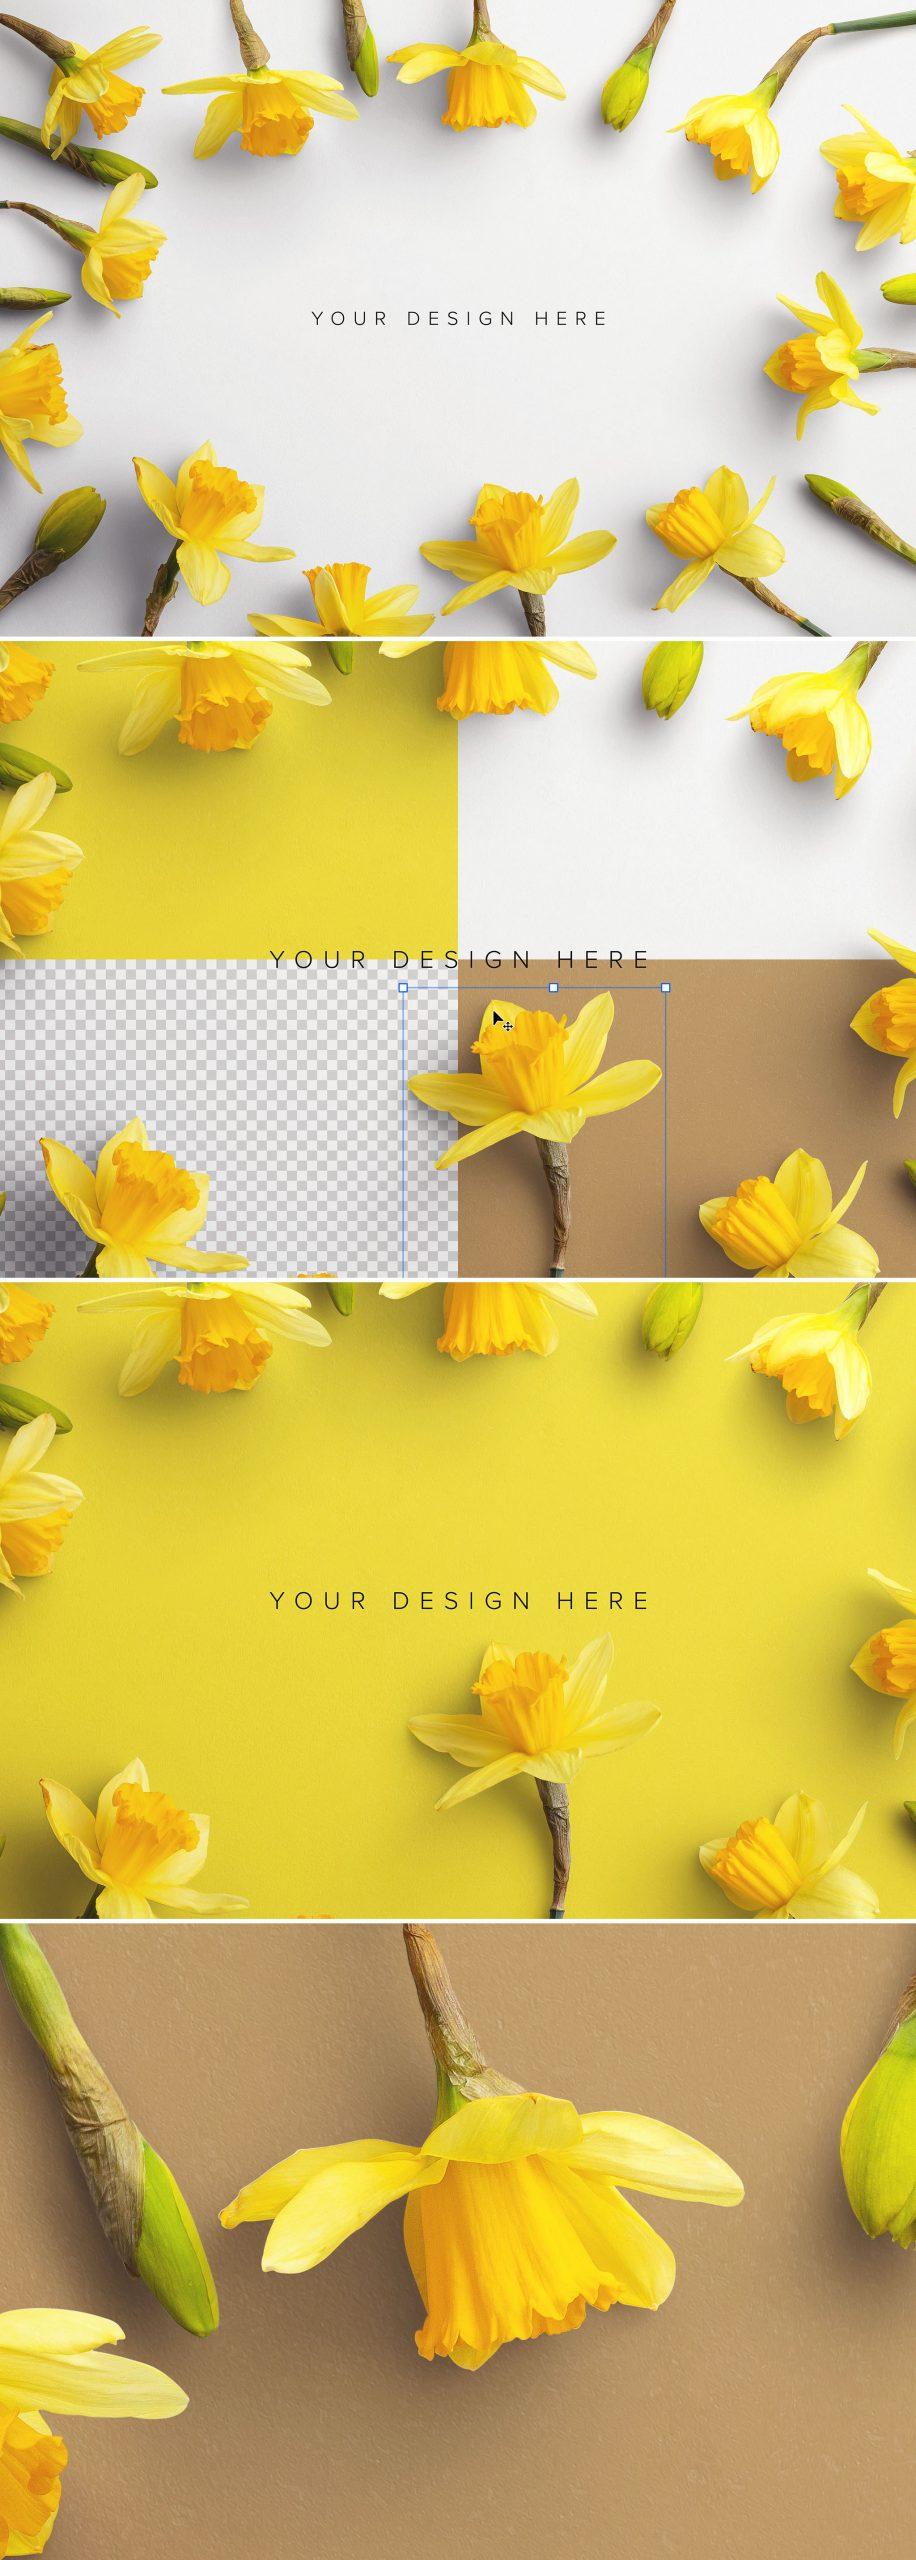 Daffodils Custom Scene Creator Template 1Preview1